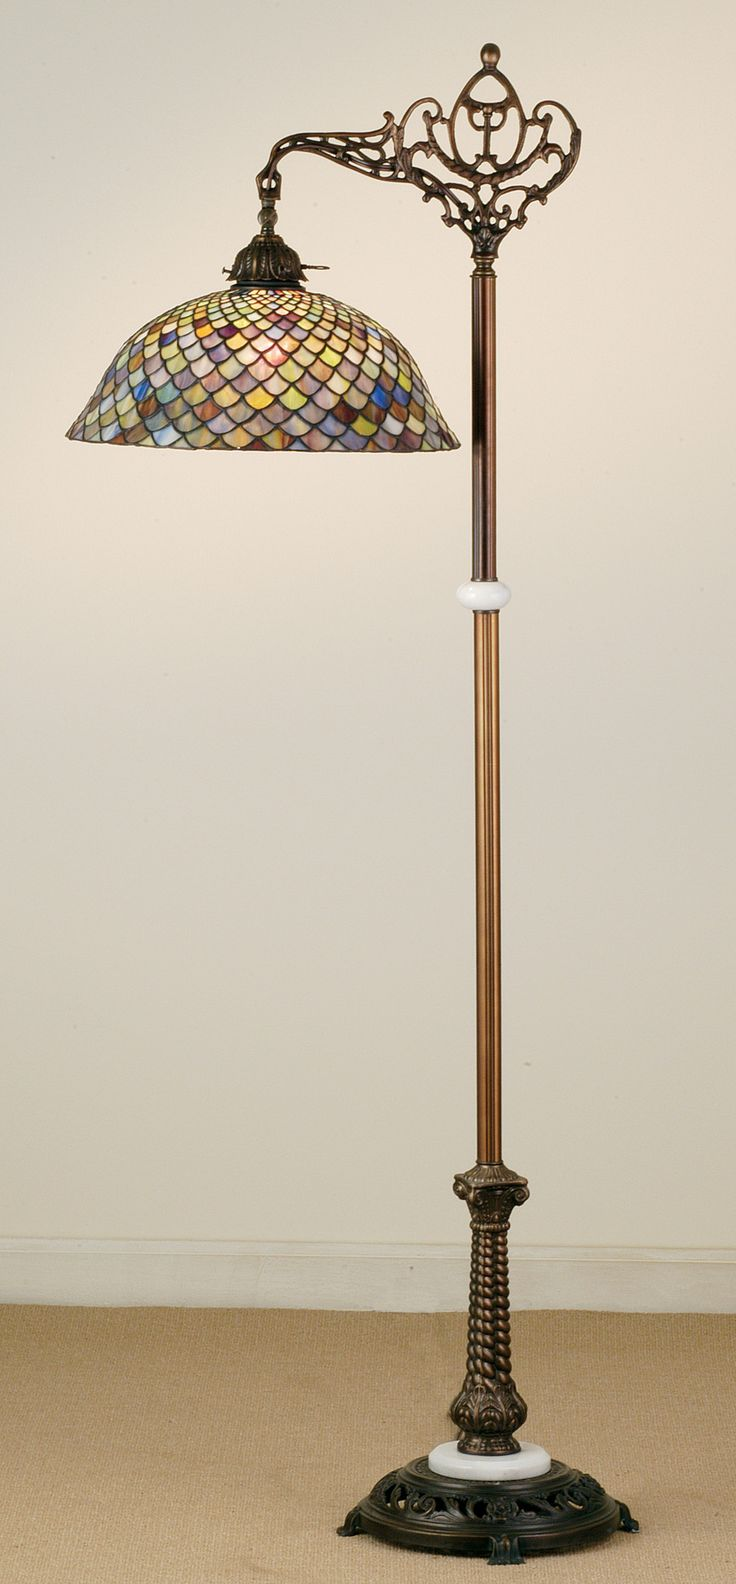 Dale tiffany floor lamps foter - Meyda 60 H Tiffany Fishscale Bridge Arm Floor Lamp